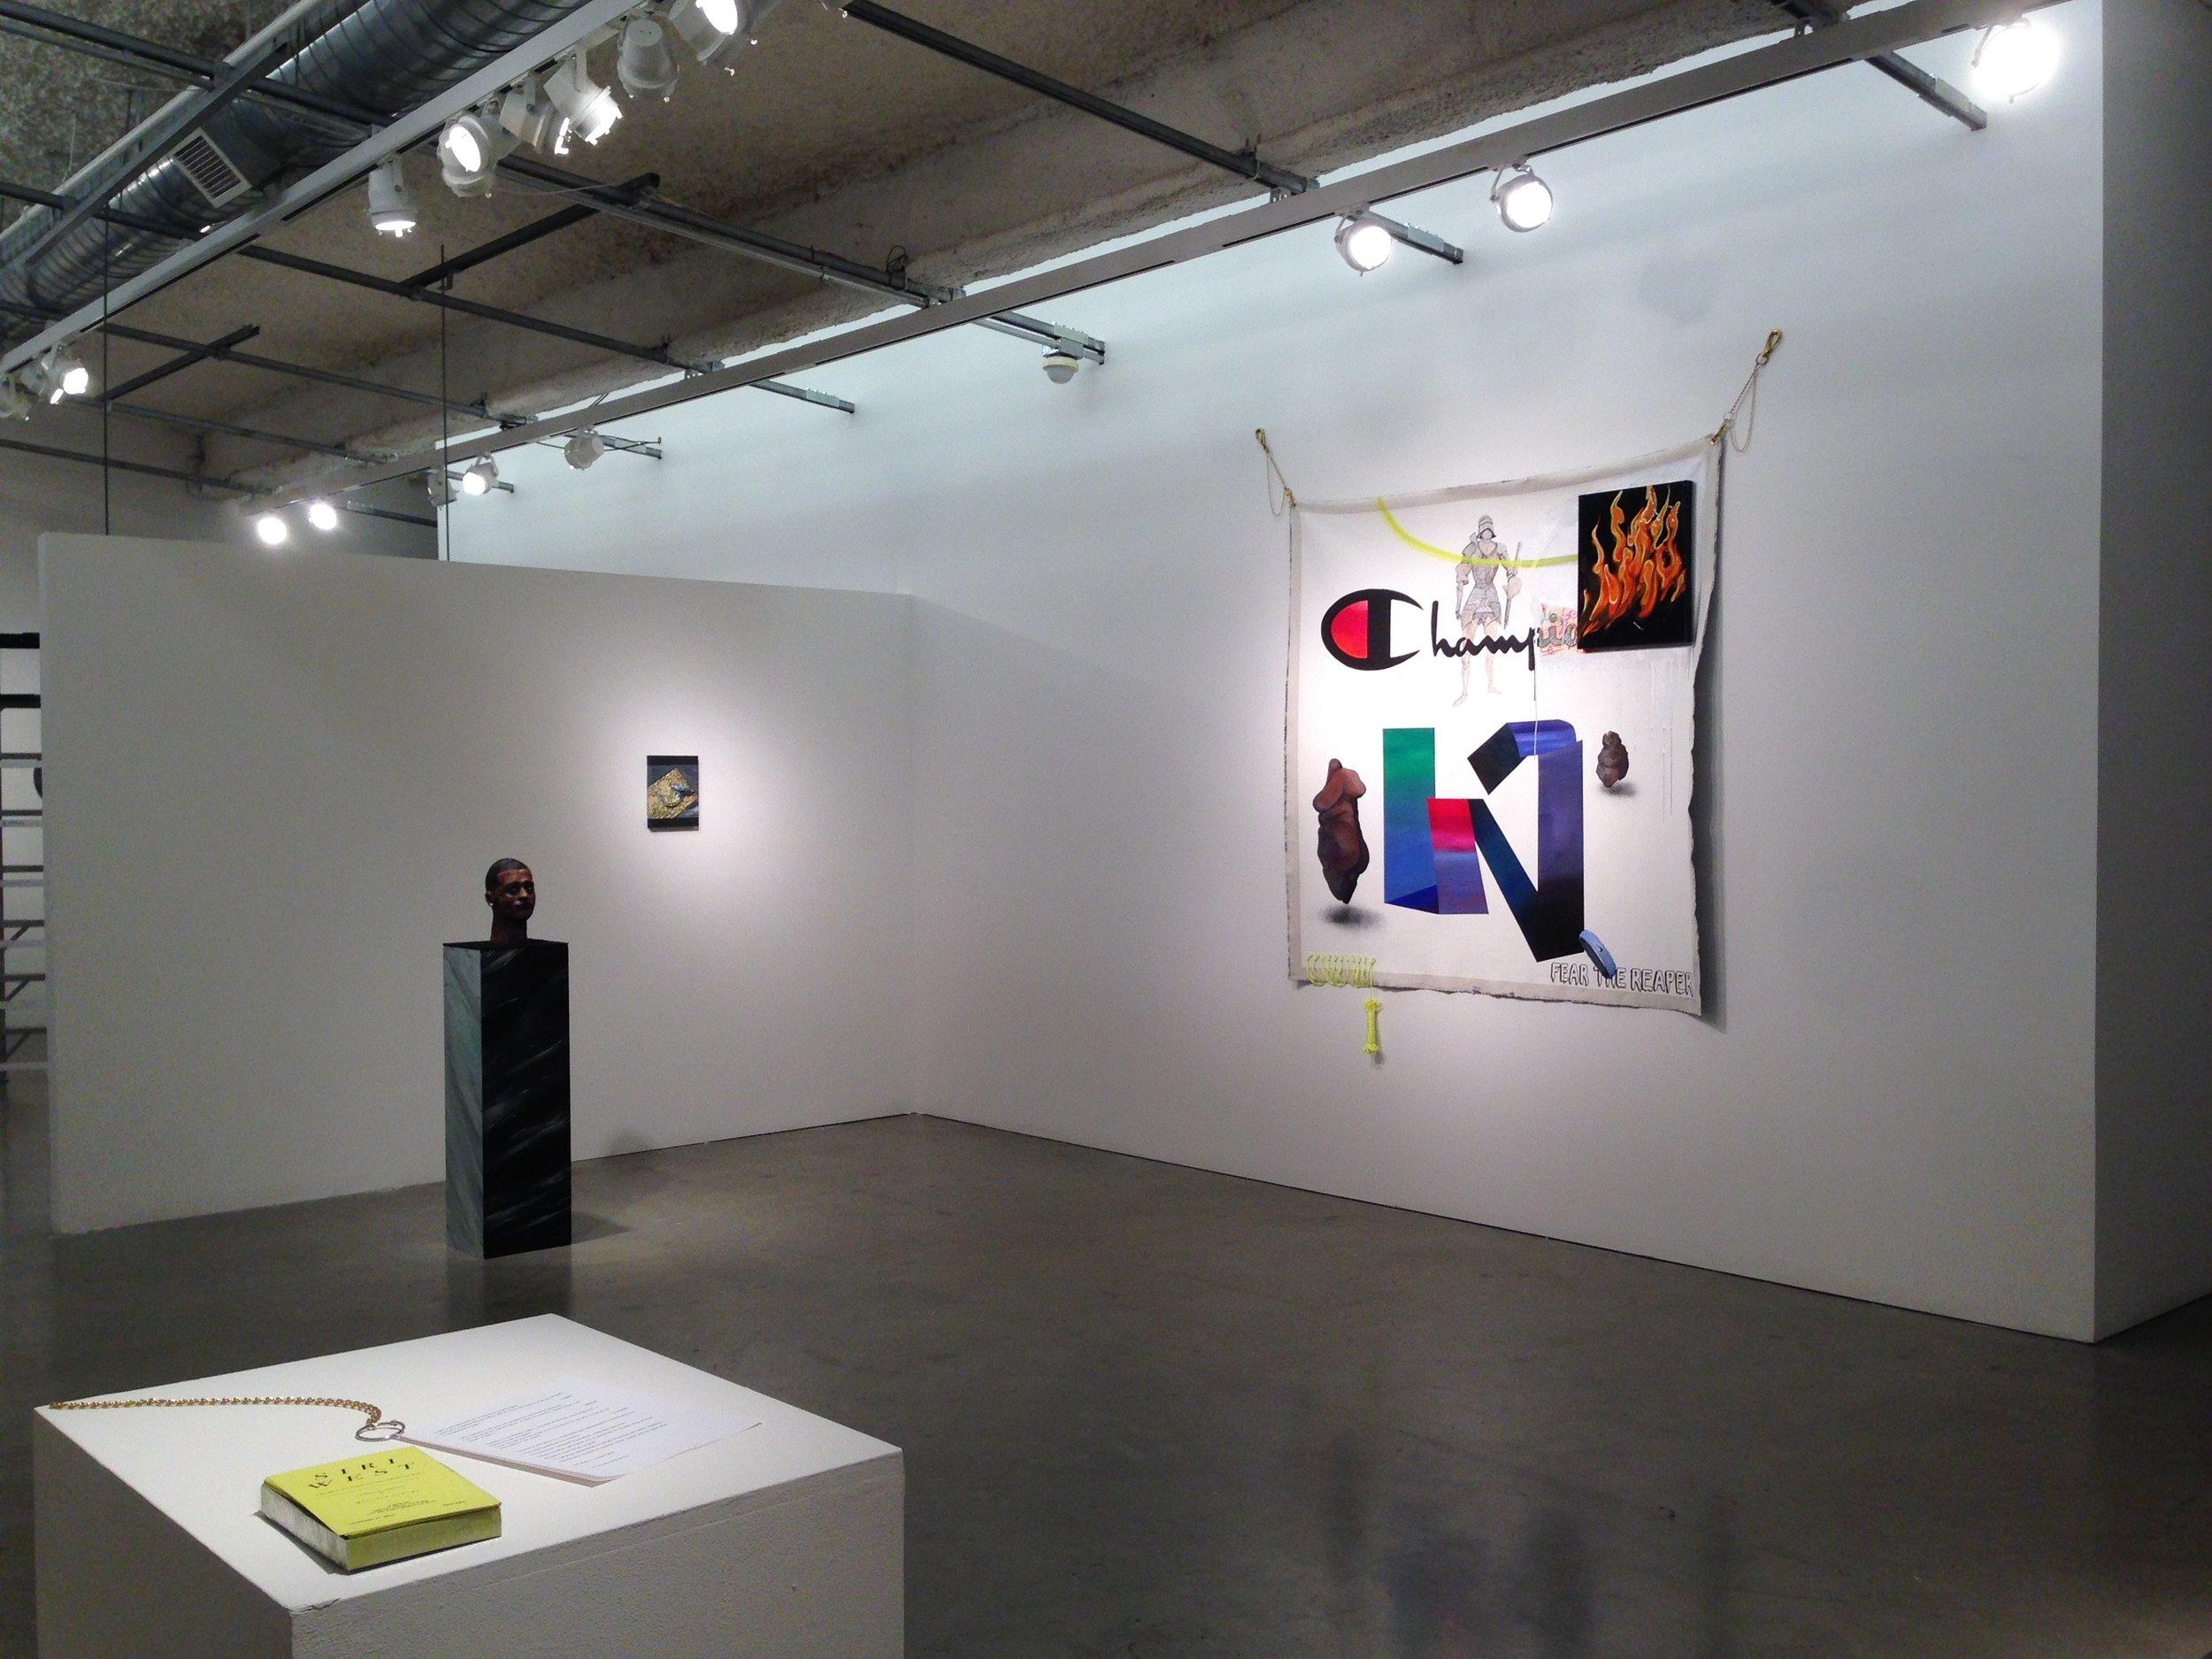 Siri West installation 2014